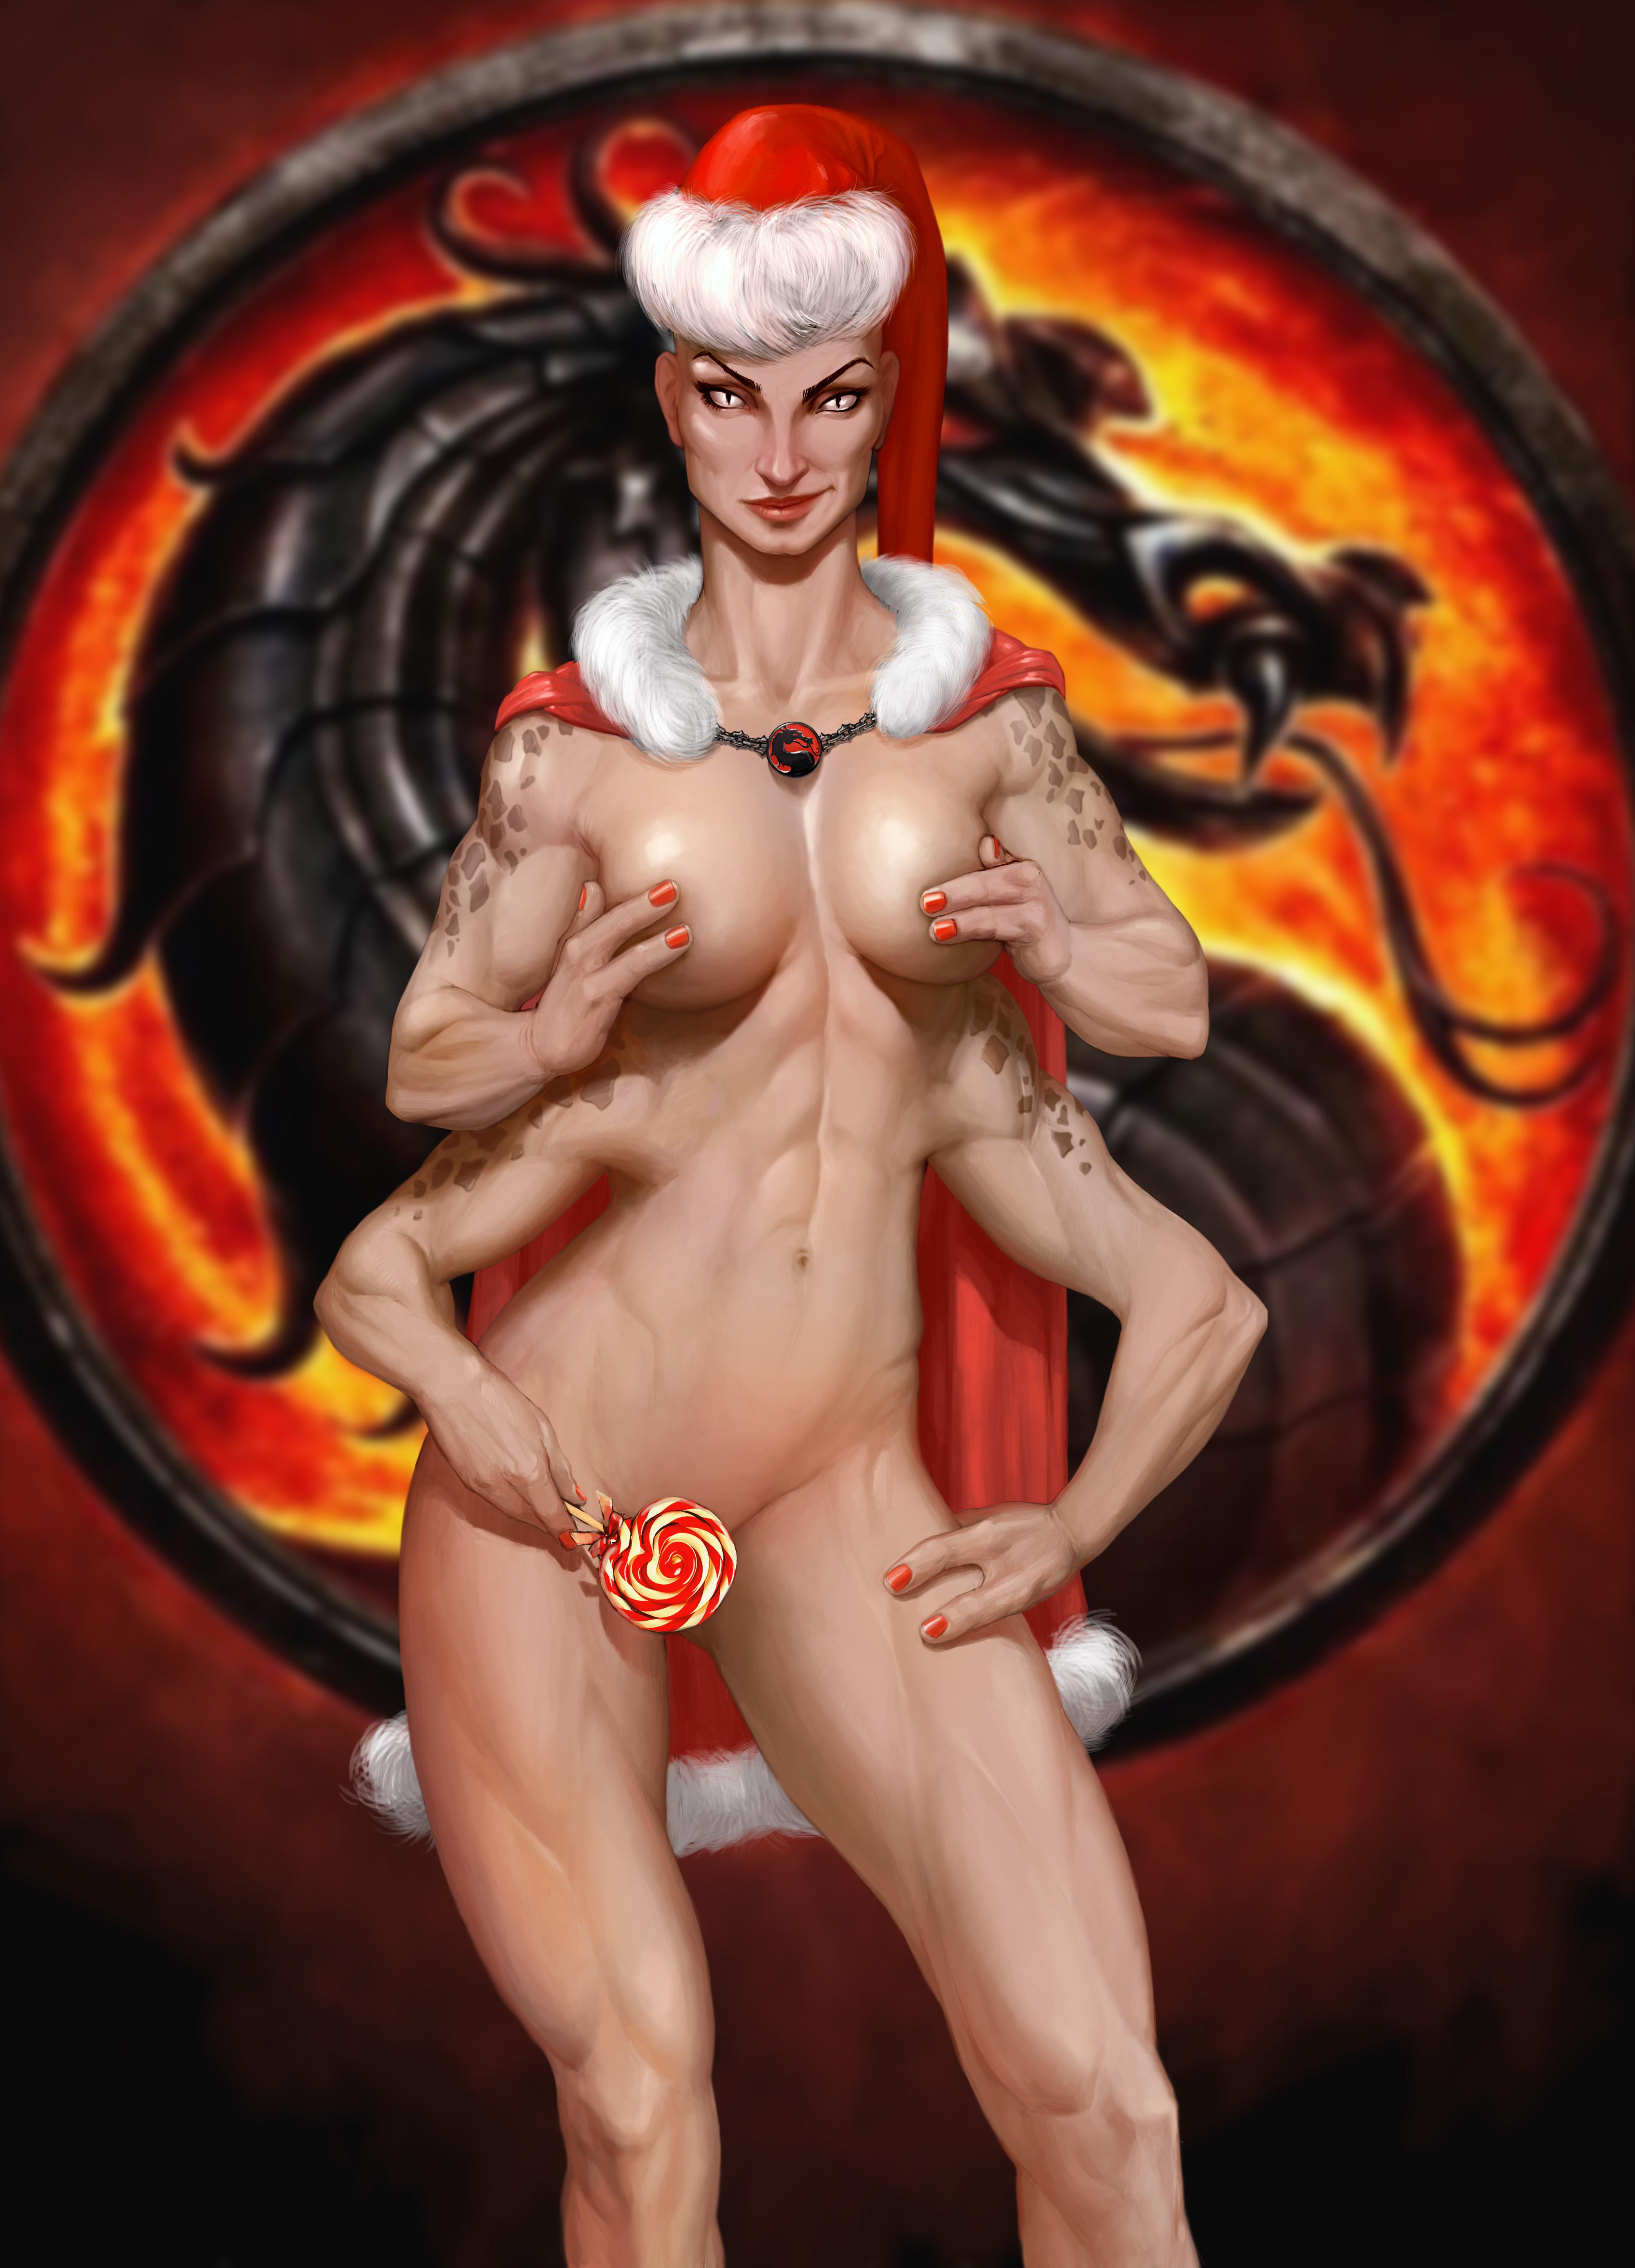 Mortal kombat women naked giant boobs pictures fucks girls